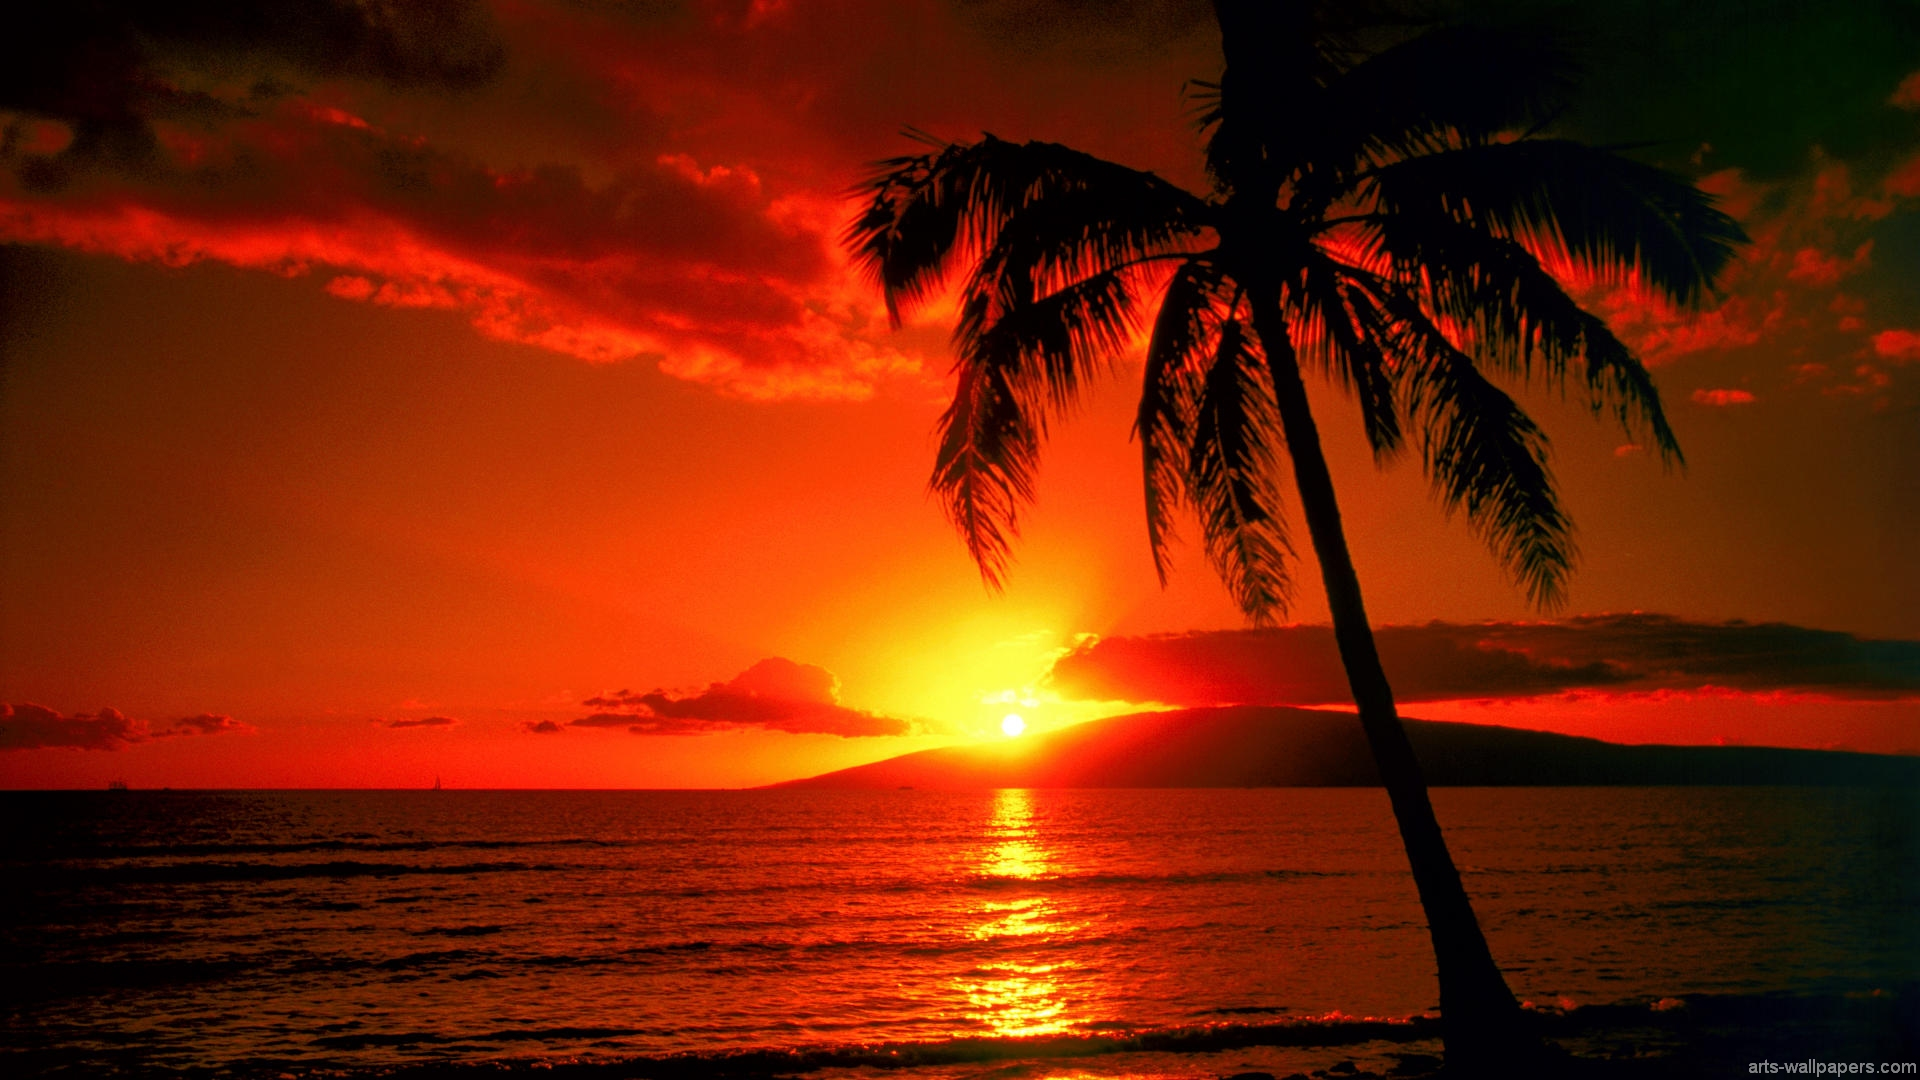 Sunset Tropical Island